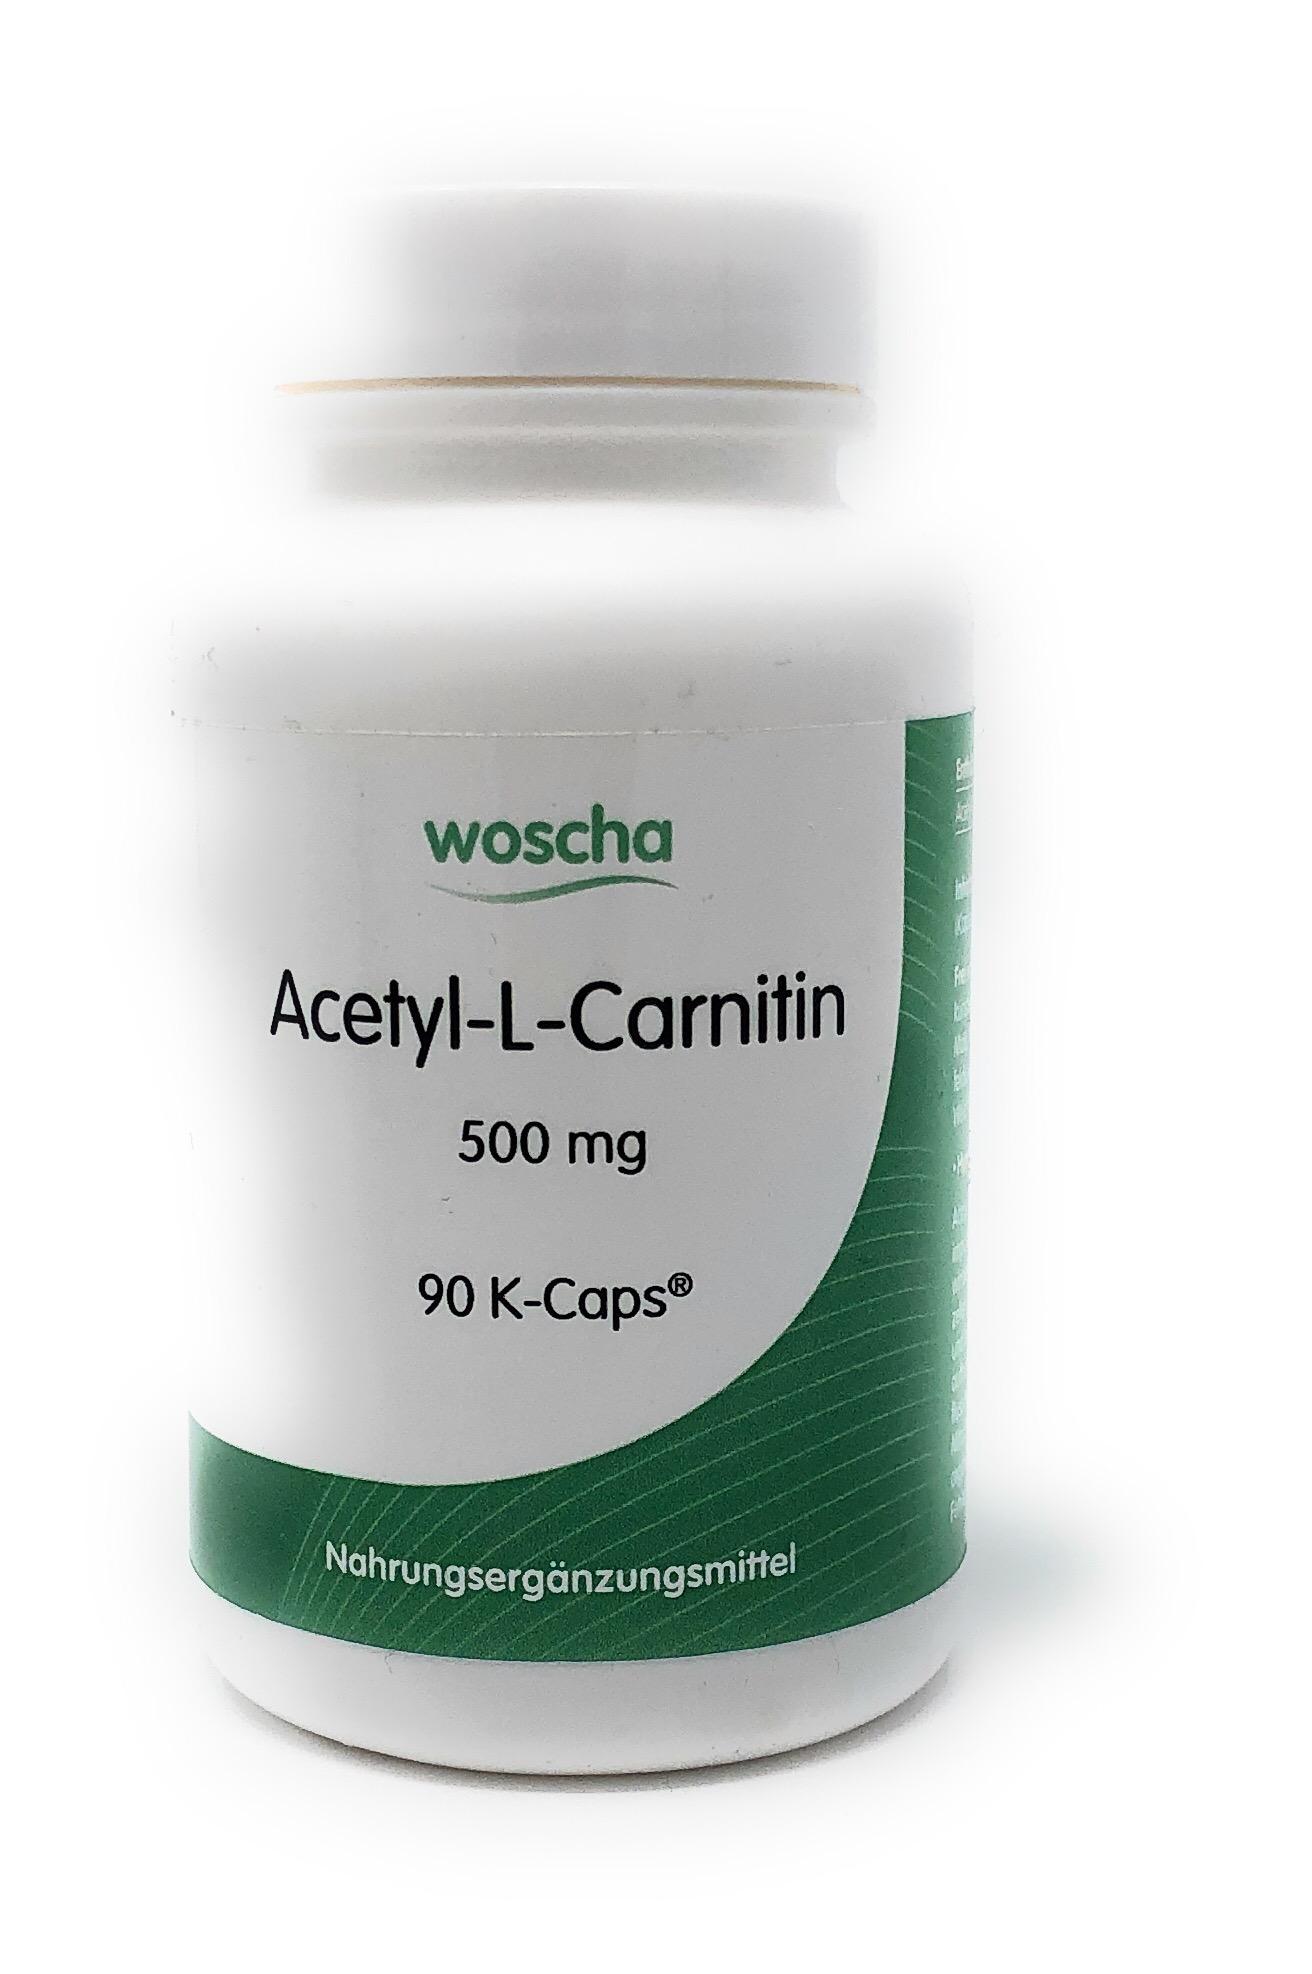 woscha Acetyl-L-Carnitin 90 K-CAPS® (53g) (vegan)